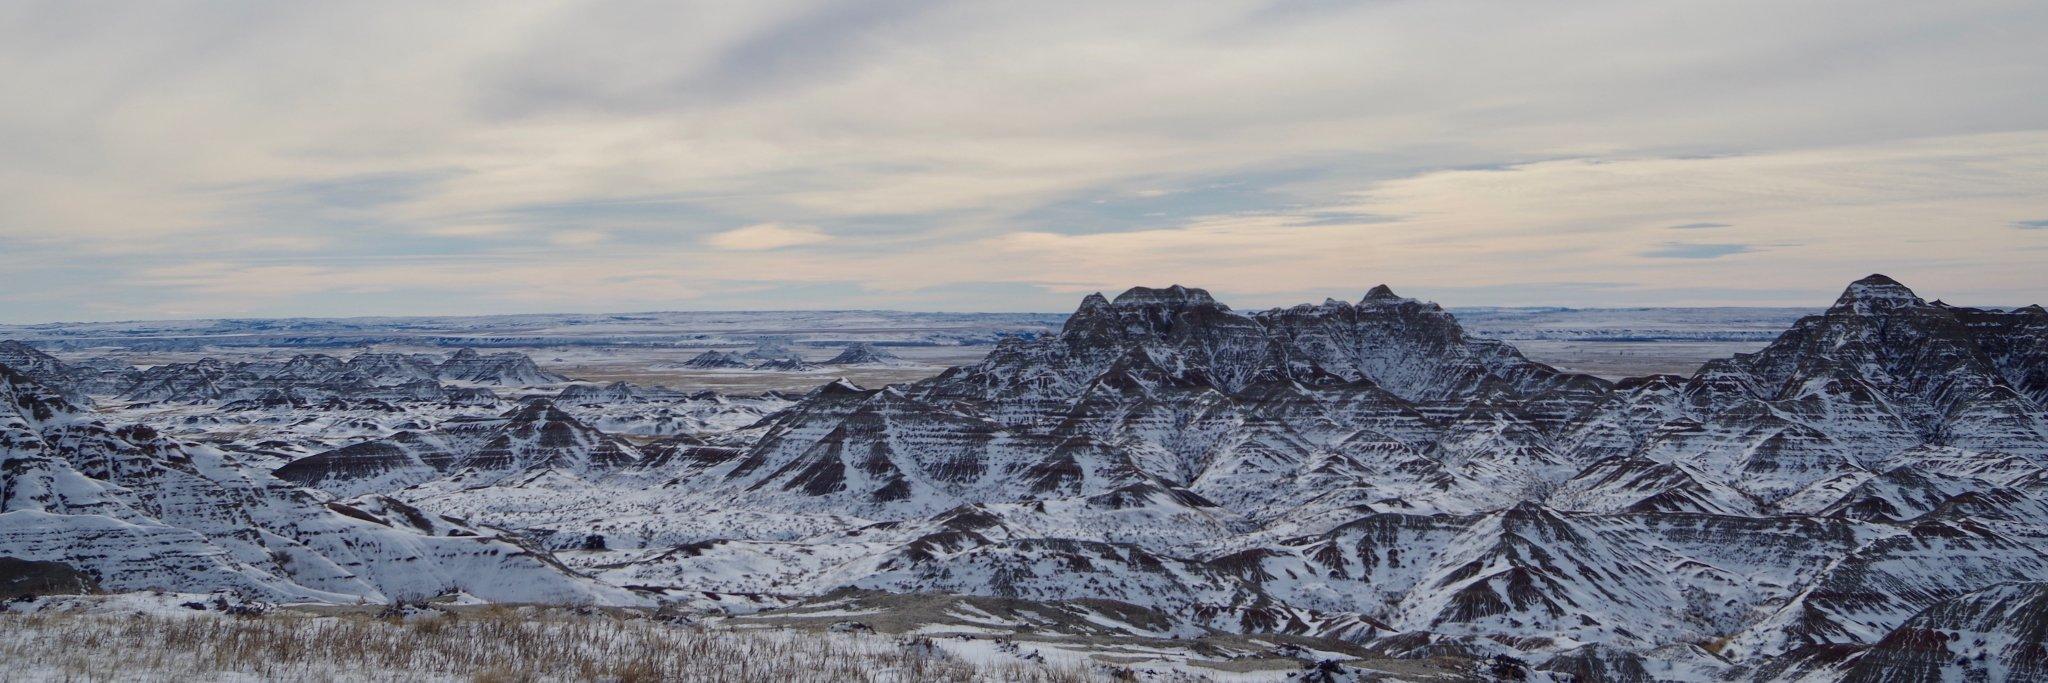 Badlands Natl Park